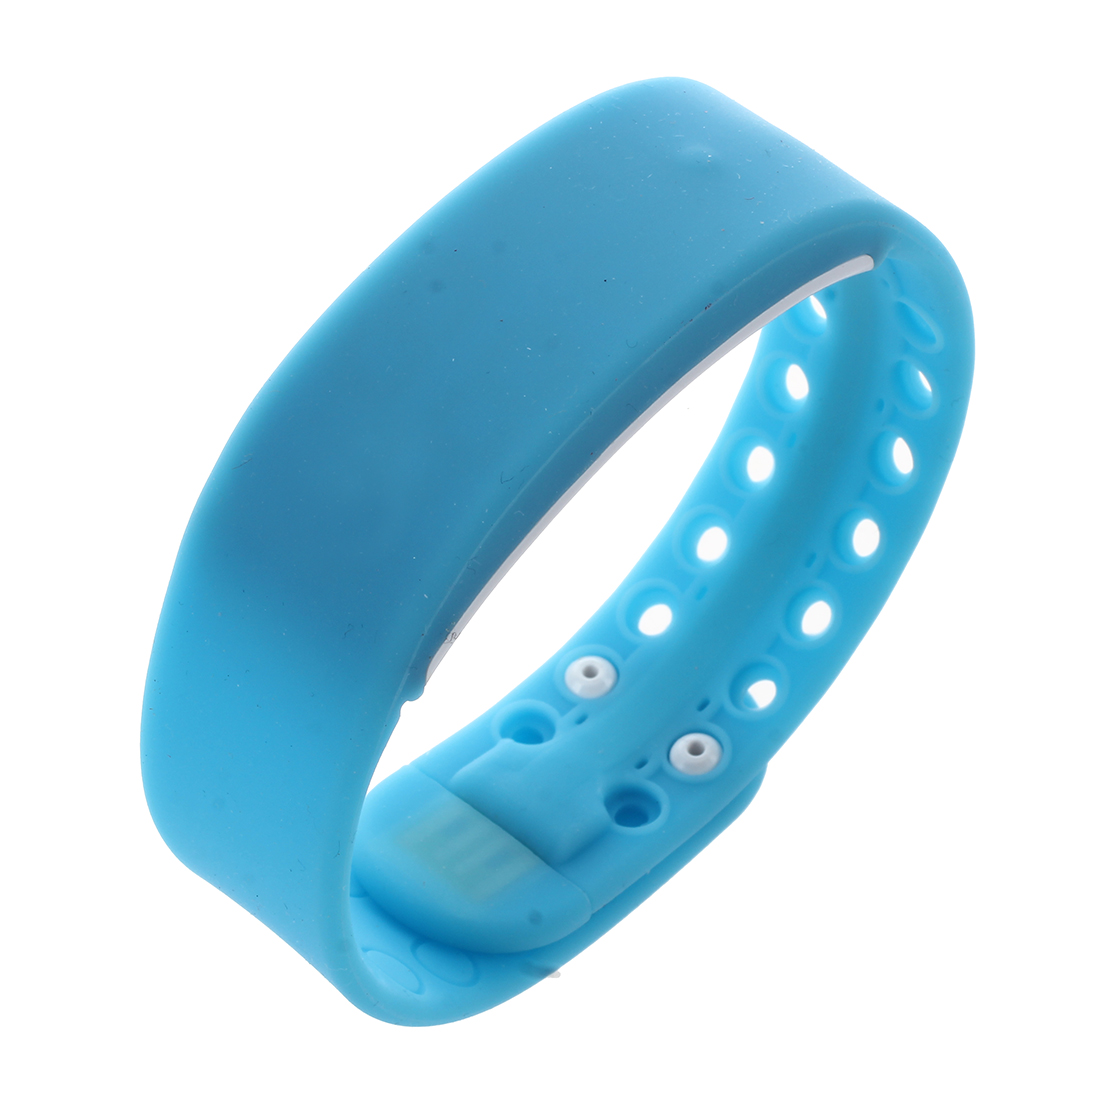 New Waterproof Movement Health Pedometer Sleep Monitoring Smart Bracelet Watches blue